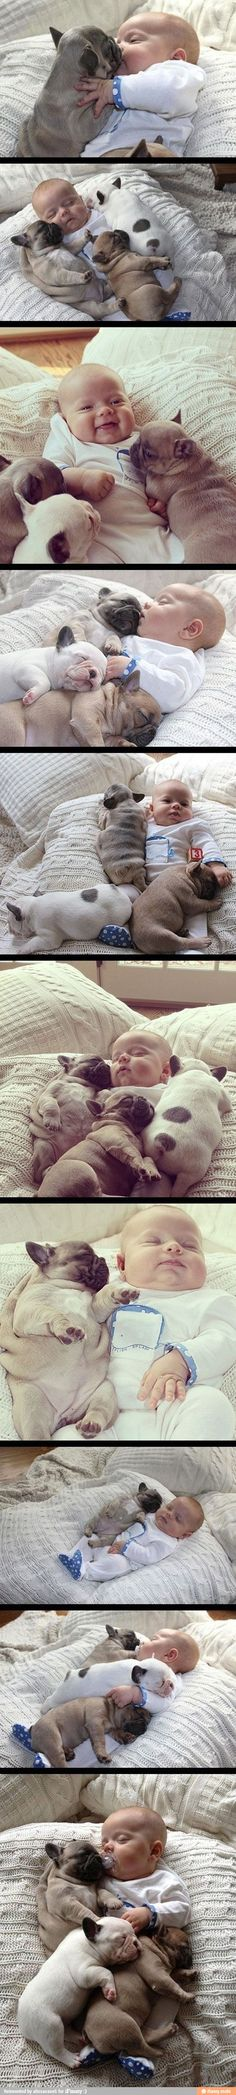 1 baby = 3 puppies. #mathskills